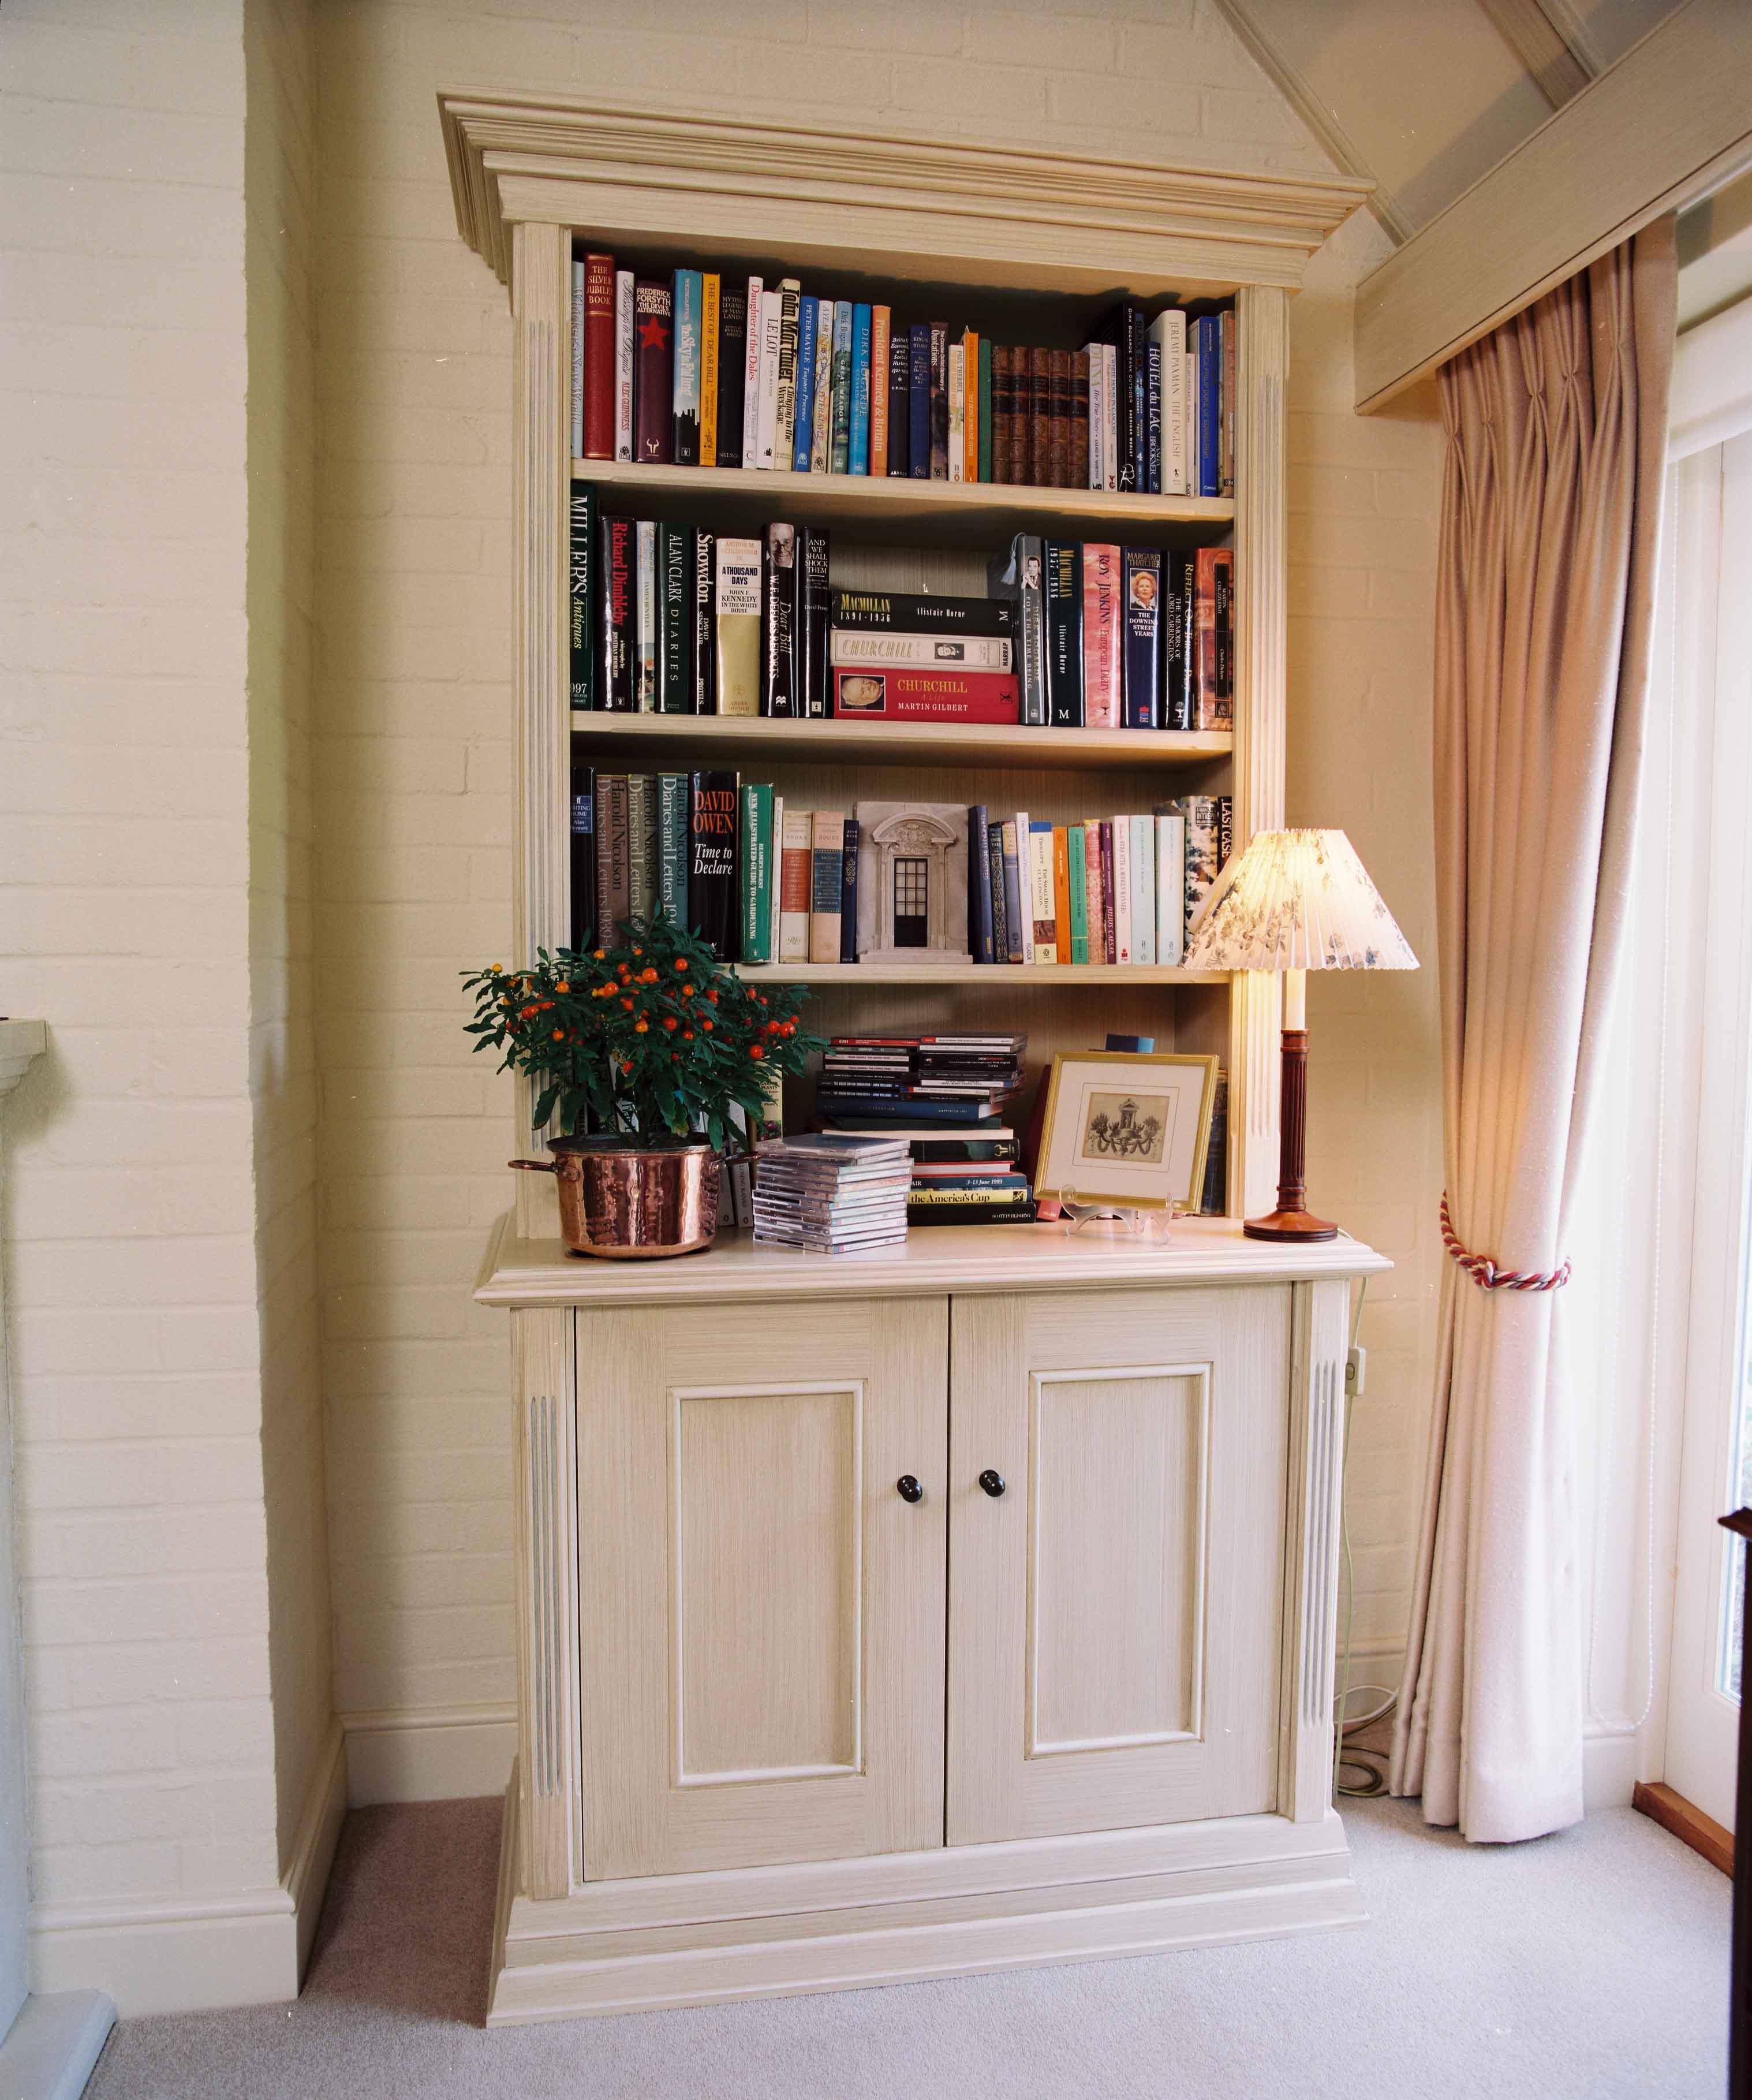 Handmade alcove cabinets